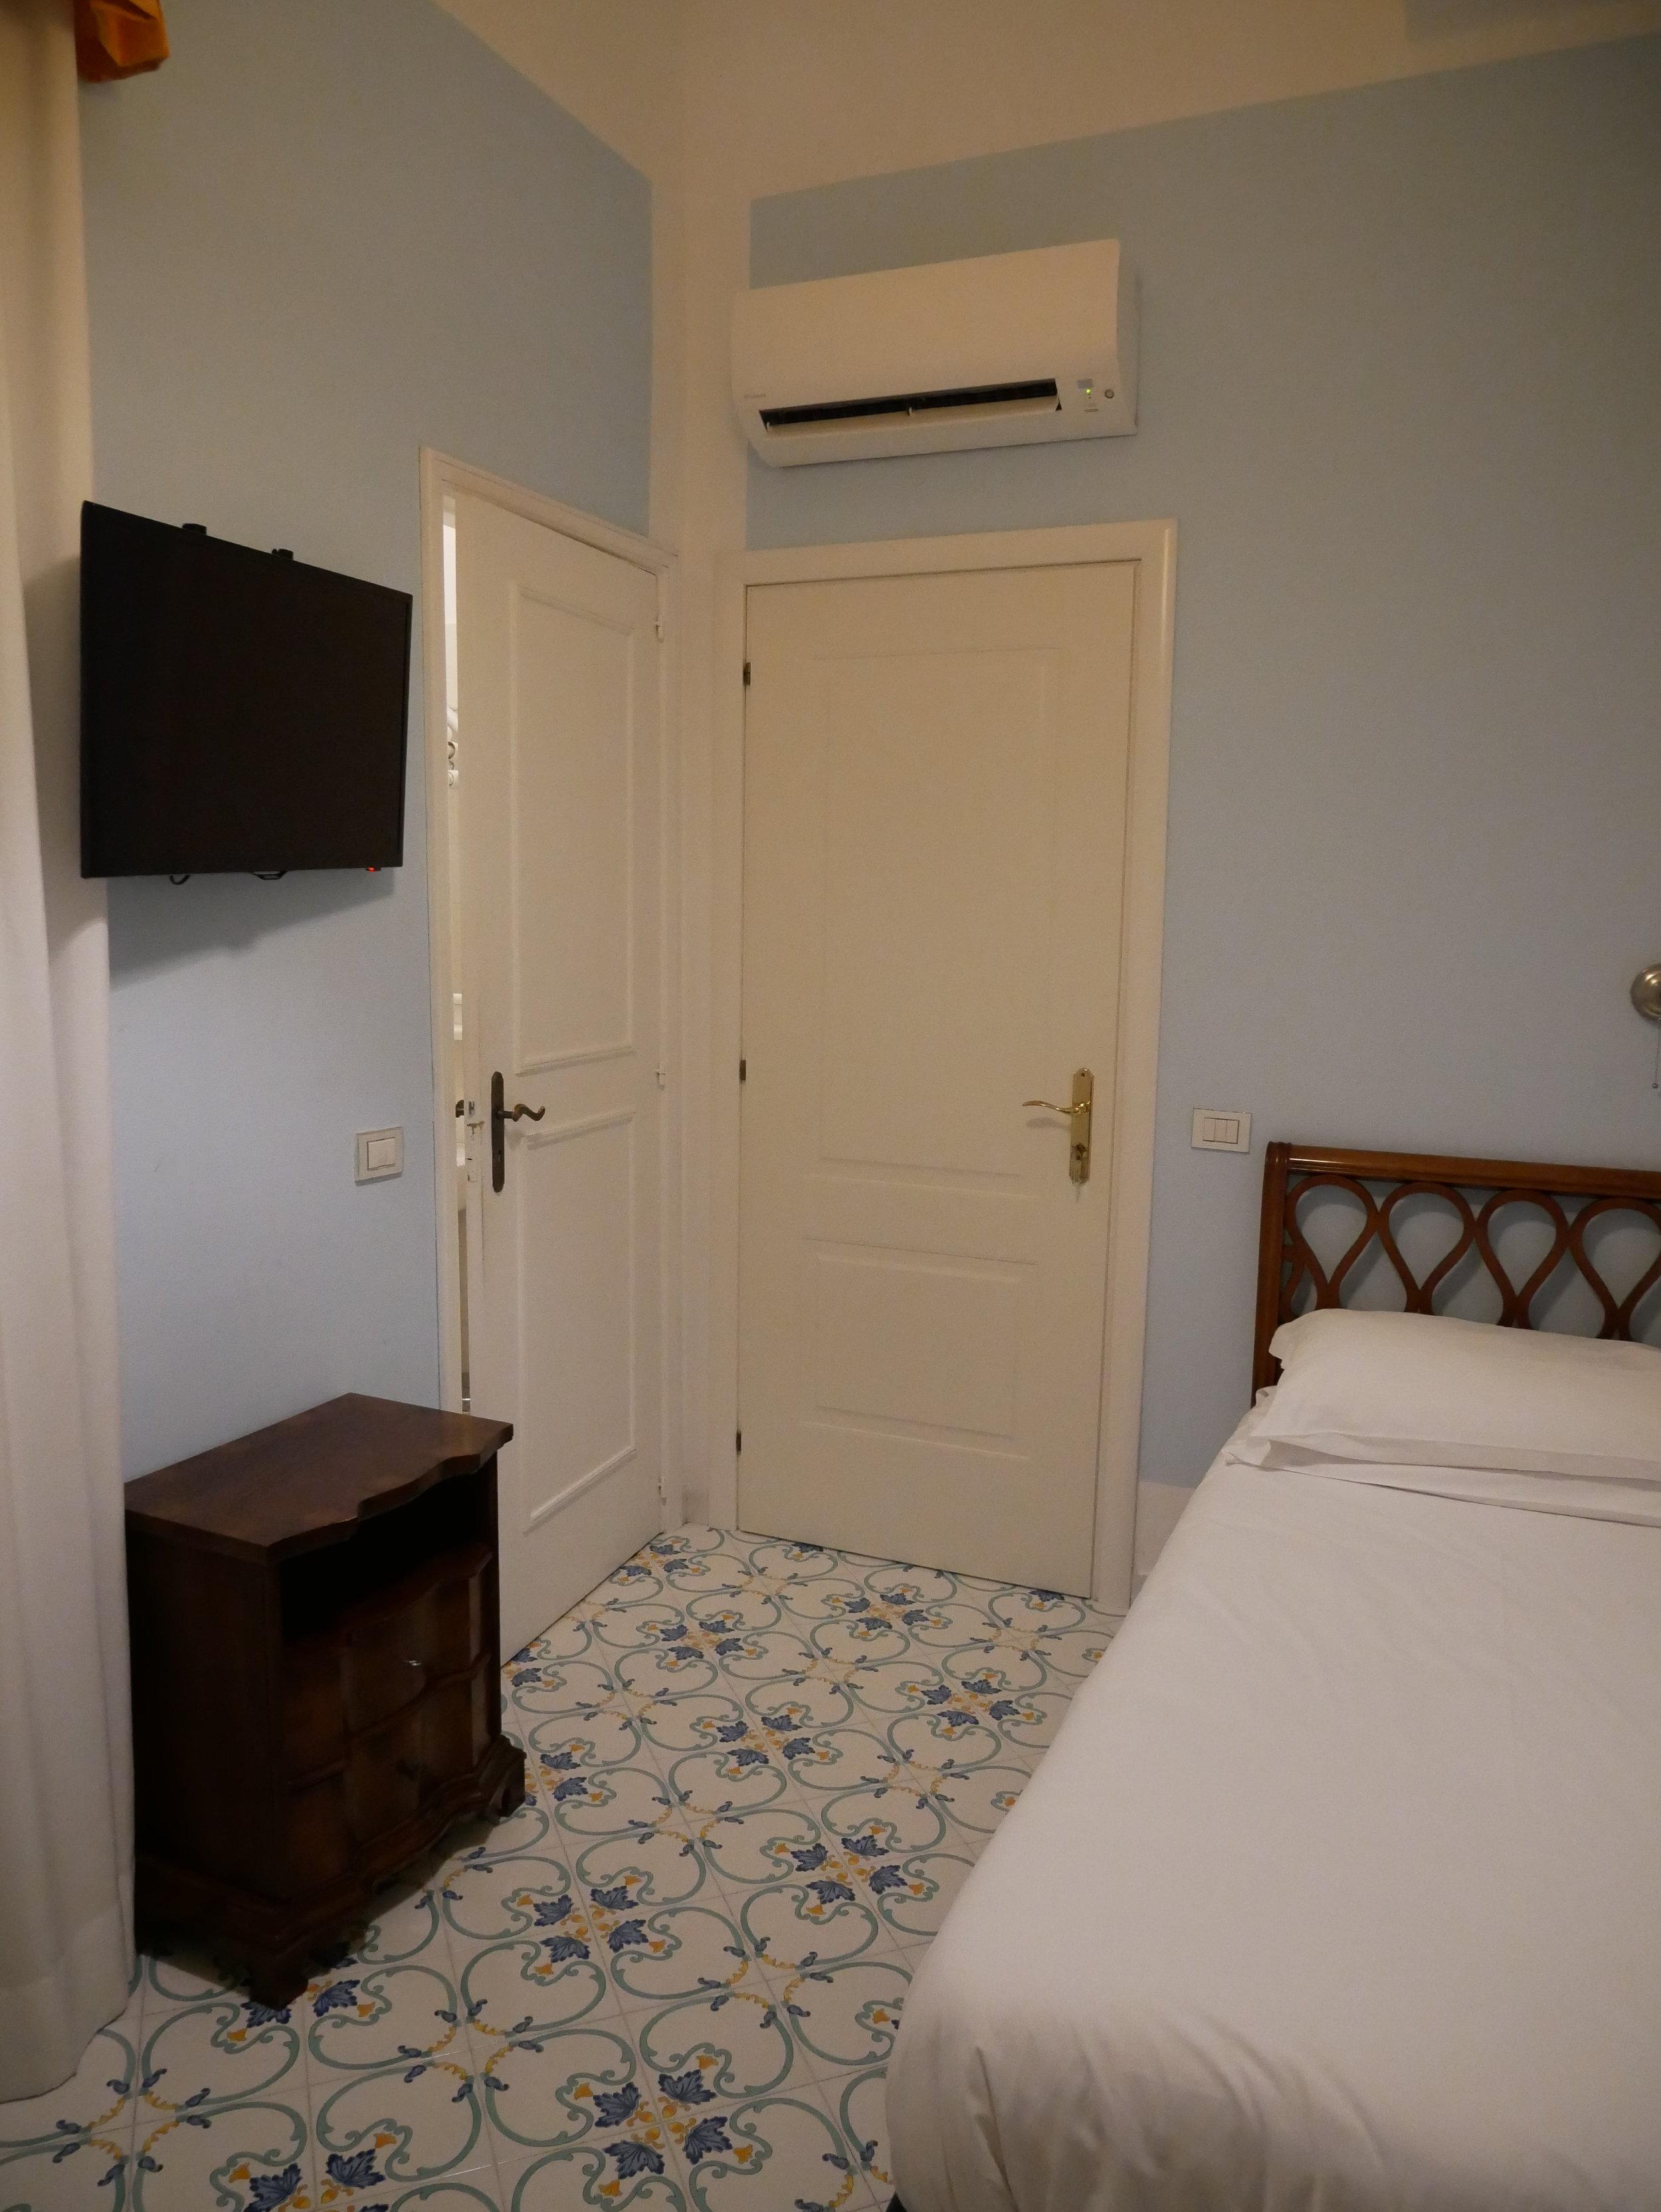 Hotel Mignon Sorrento single room 2.jpg